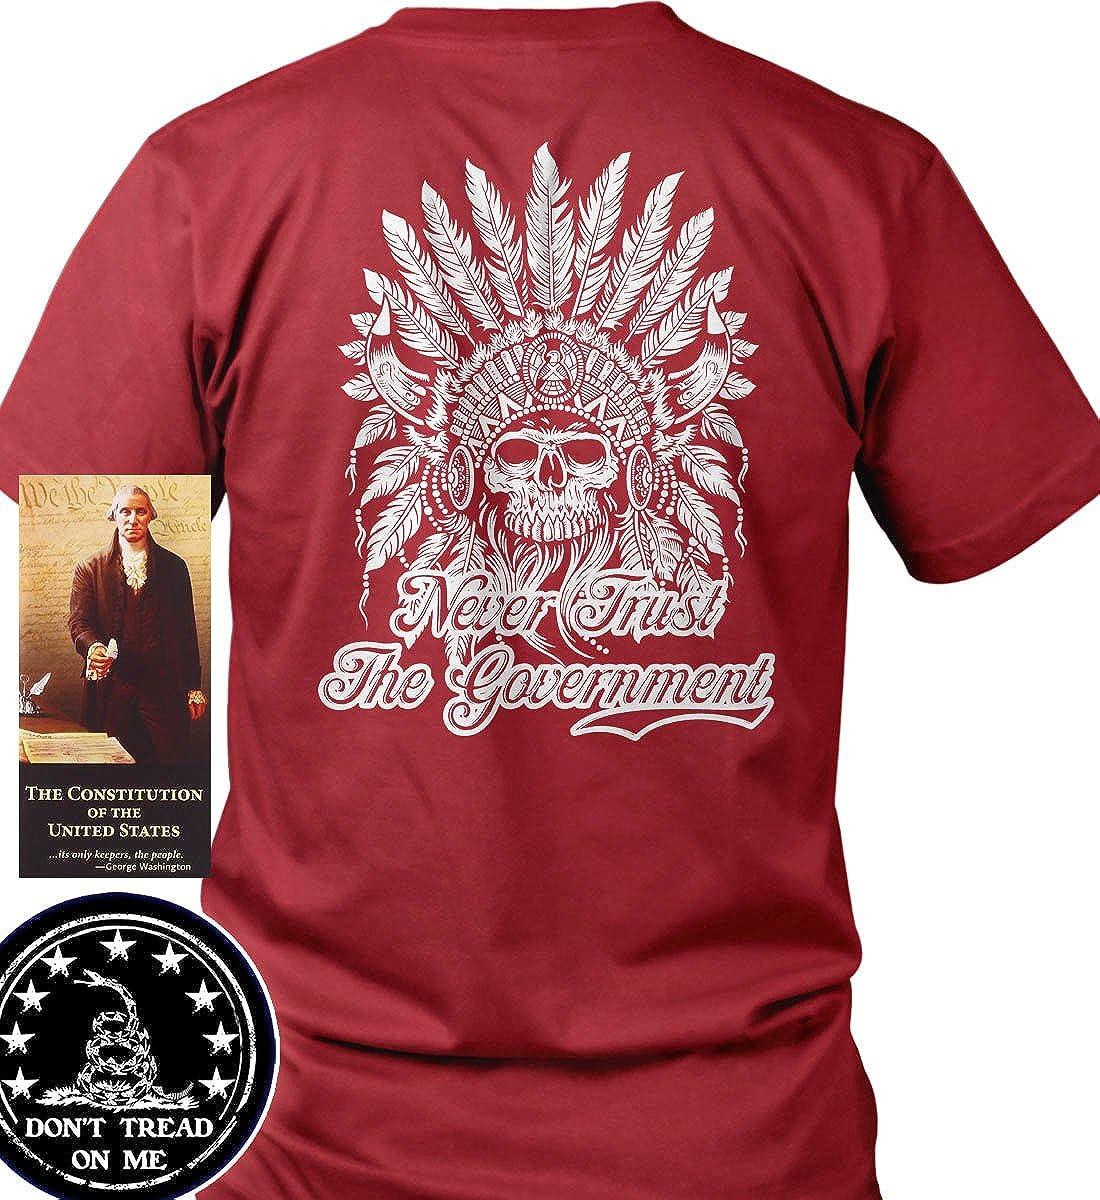 529f36fe5 Bundle of 2 items: T-shirt & 4.5